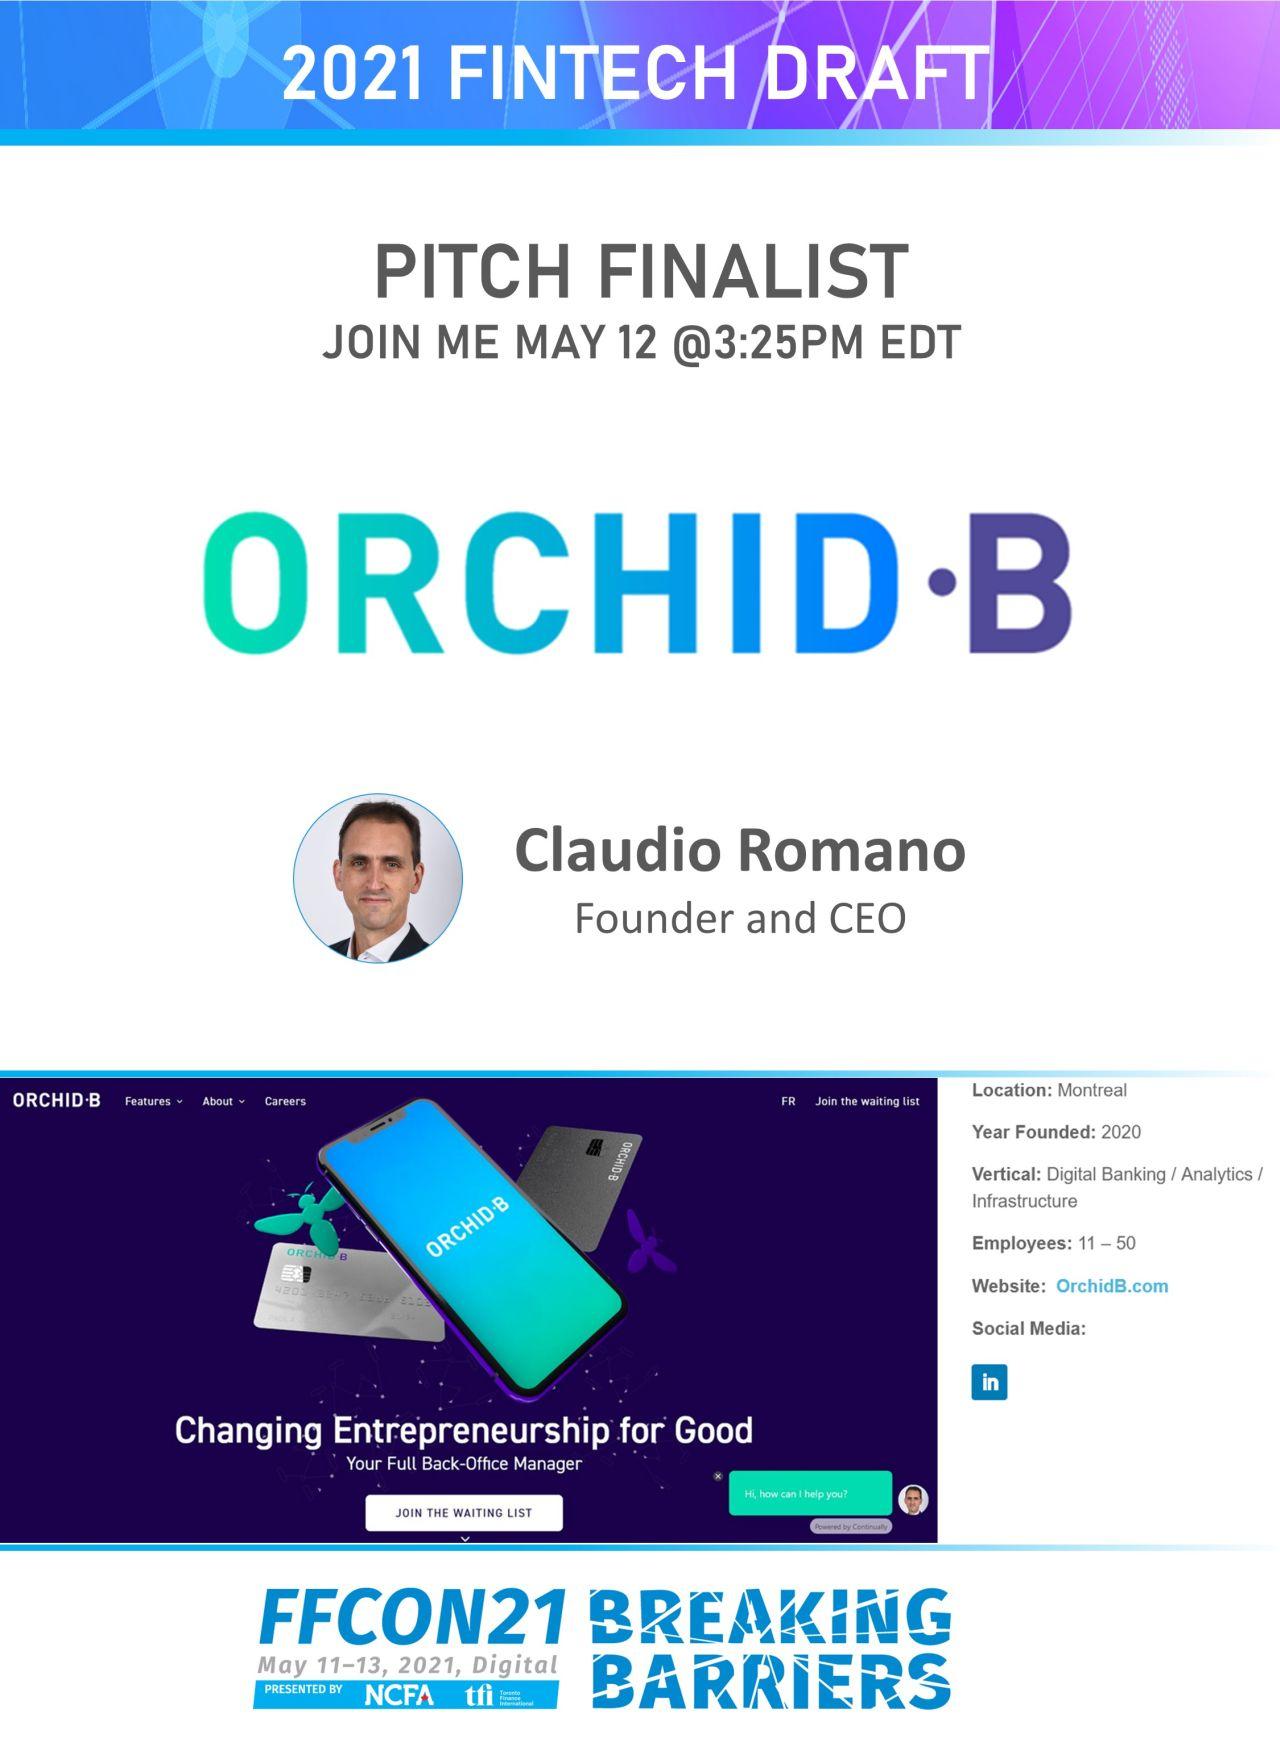 FFCON21 Pitch Finalist Orchid B